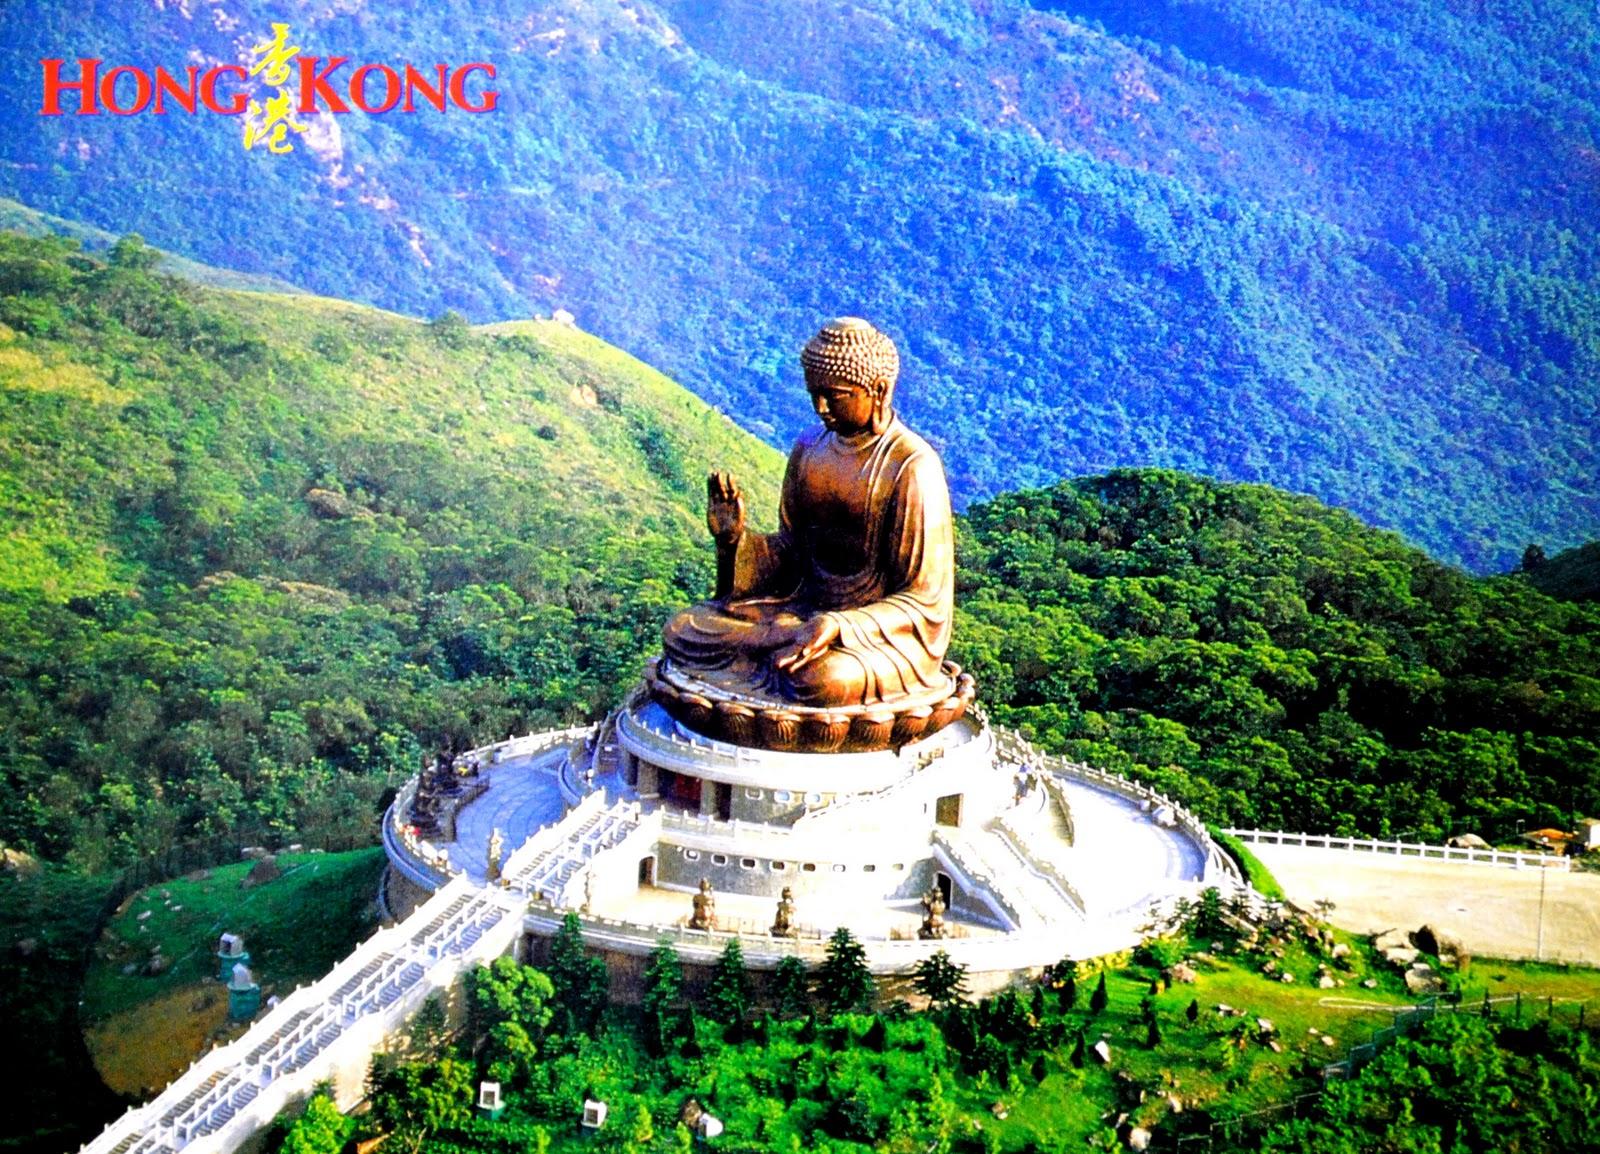 The world's largest Buddha statue